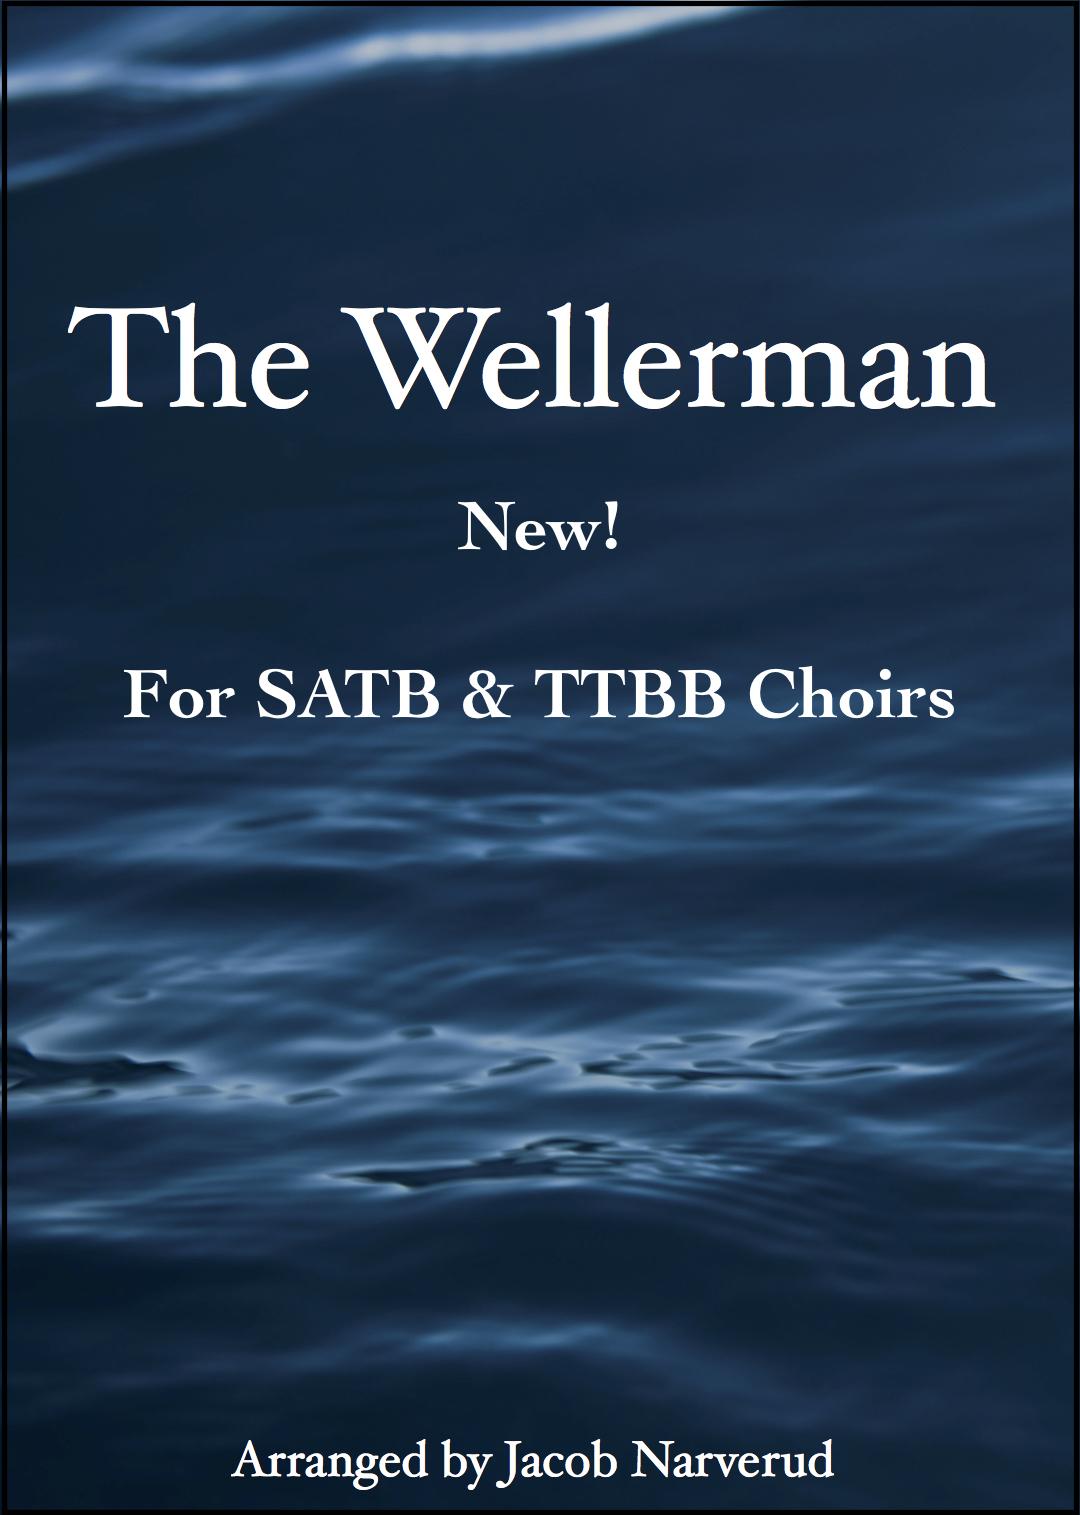 The Wellerman